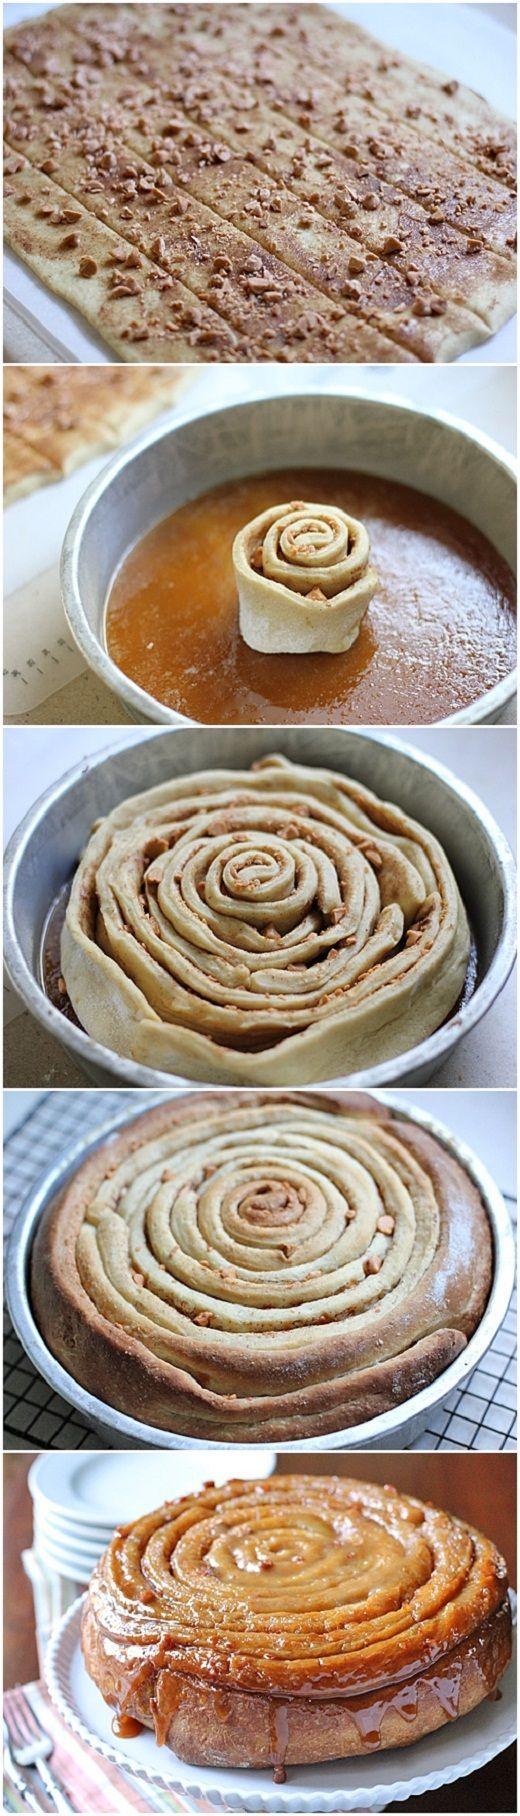 Butterscotch Spiral Coffee Cake http://inspiredreamer.com/butterscotch-spiral-coffee-cake/?utm_content=bufferf3c56&utm_medium=social&utm_source=pinterest.com&utm_campaign=buffer Made like baklava though